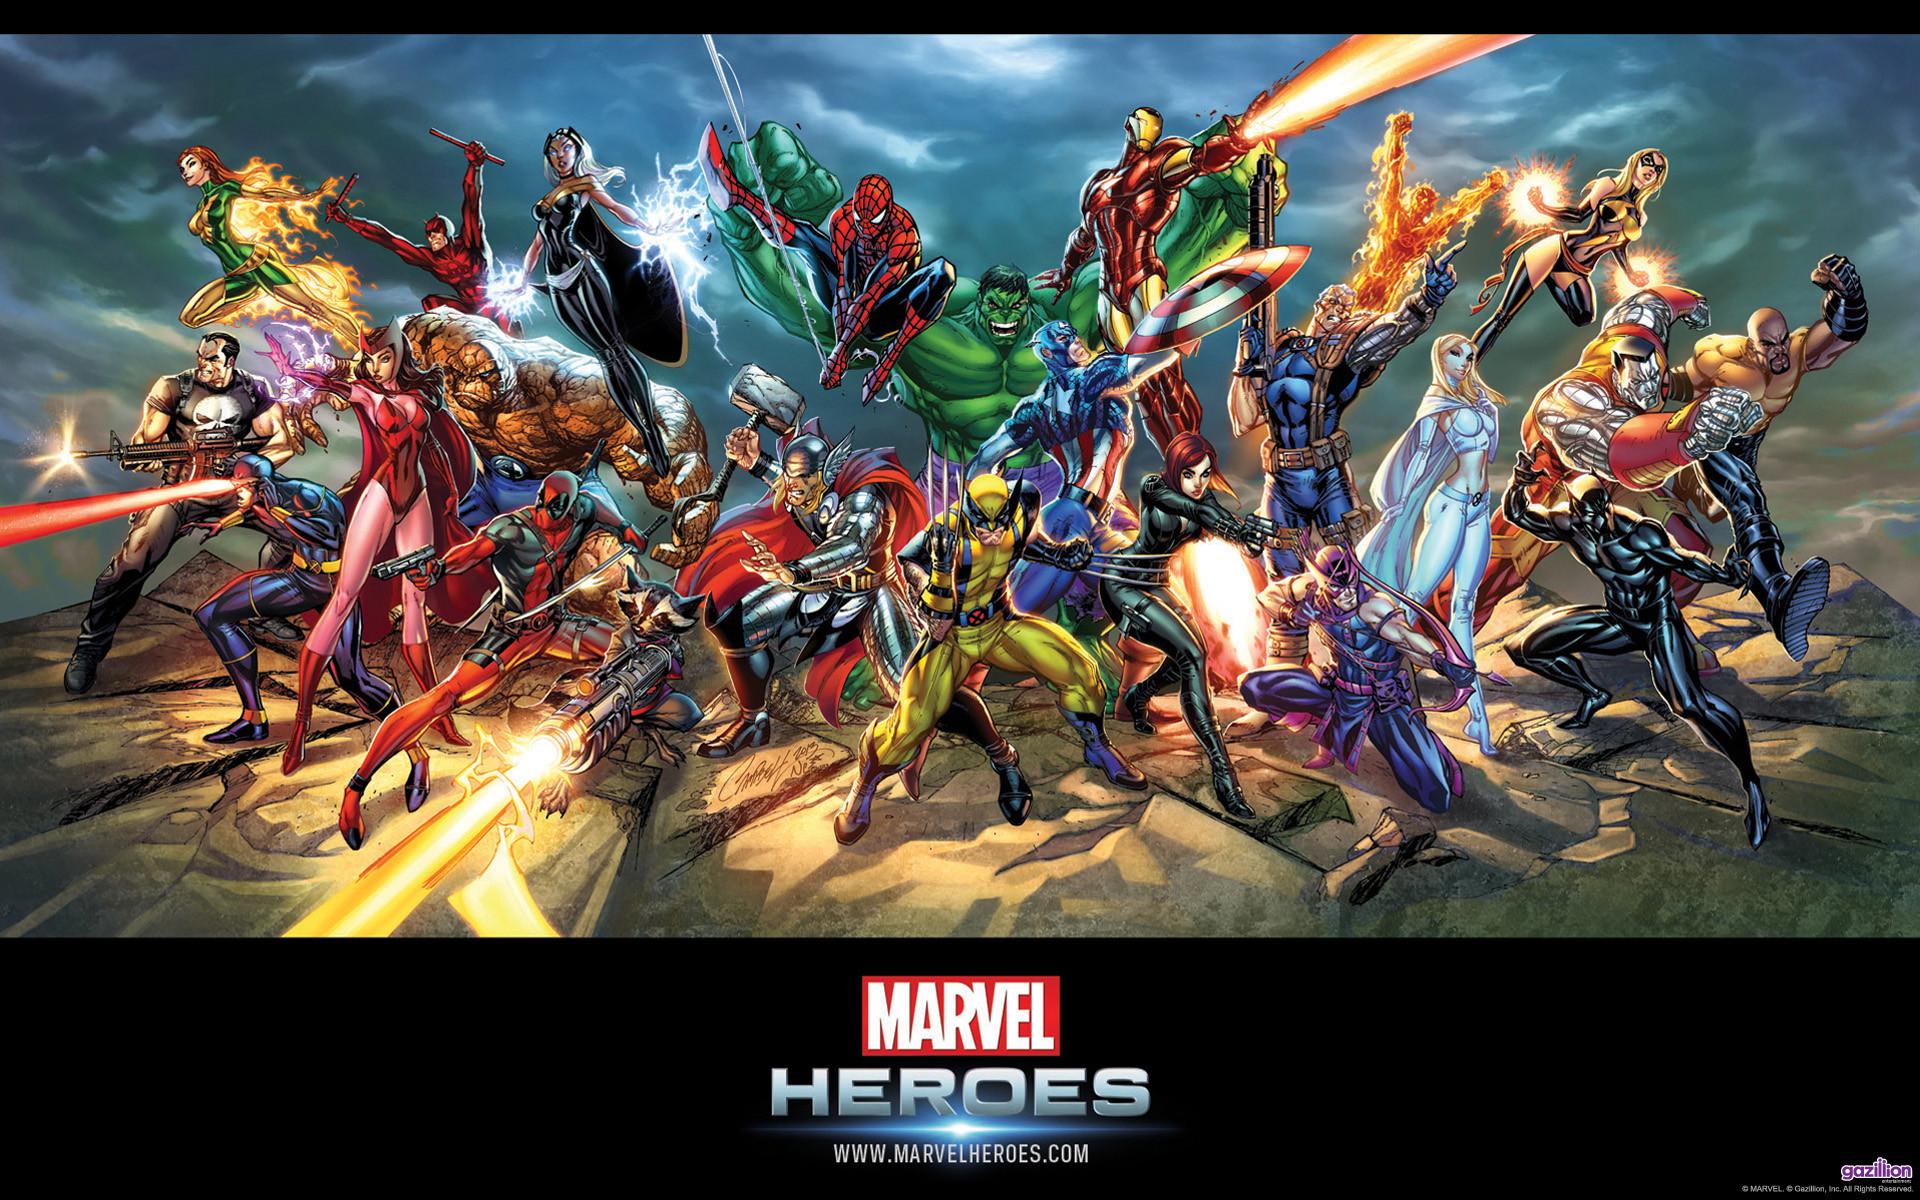 Marvel Characters Wallpaper